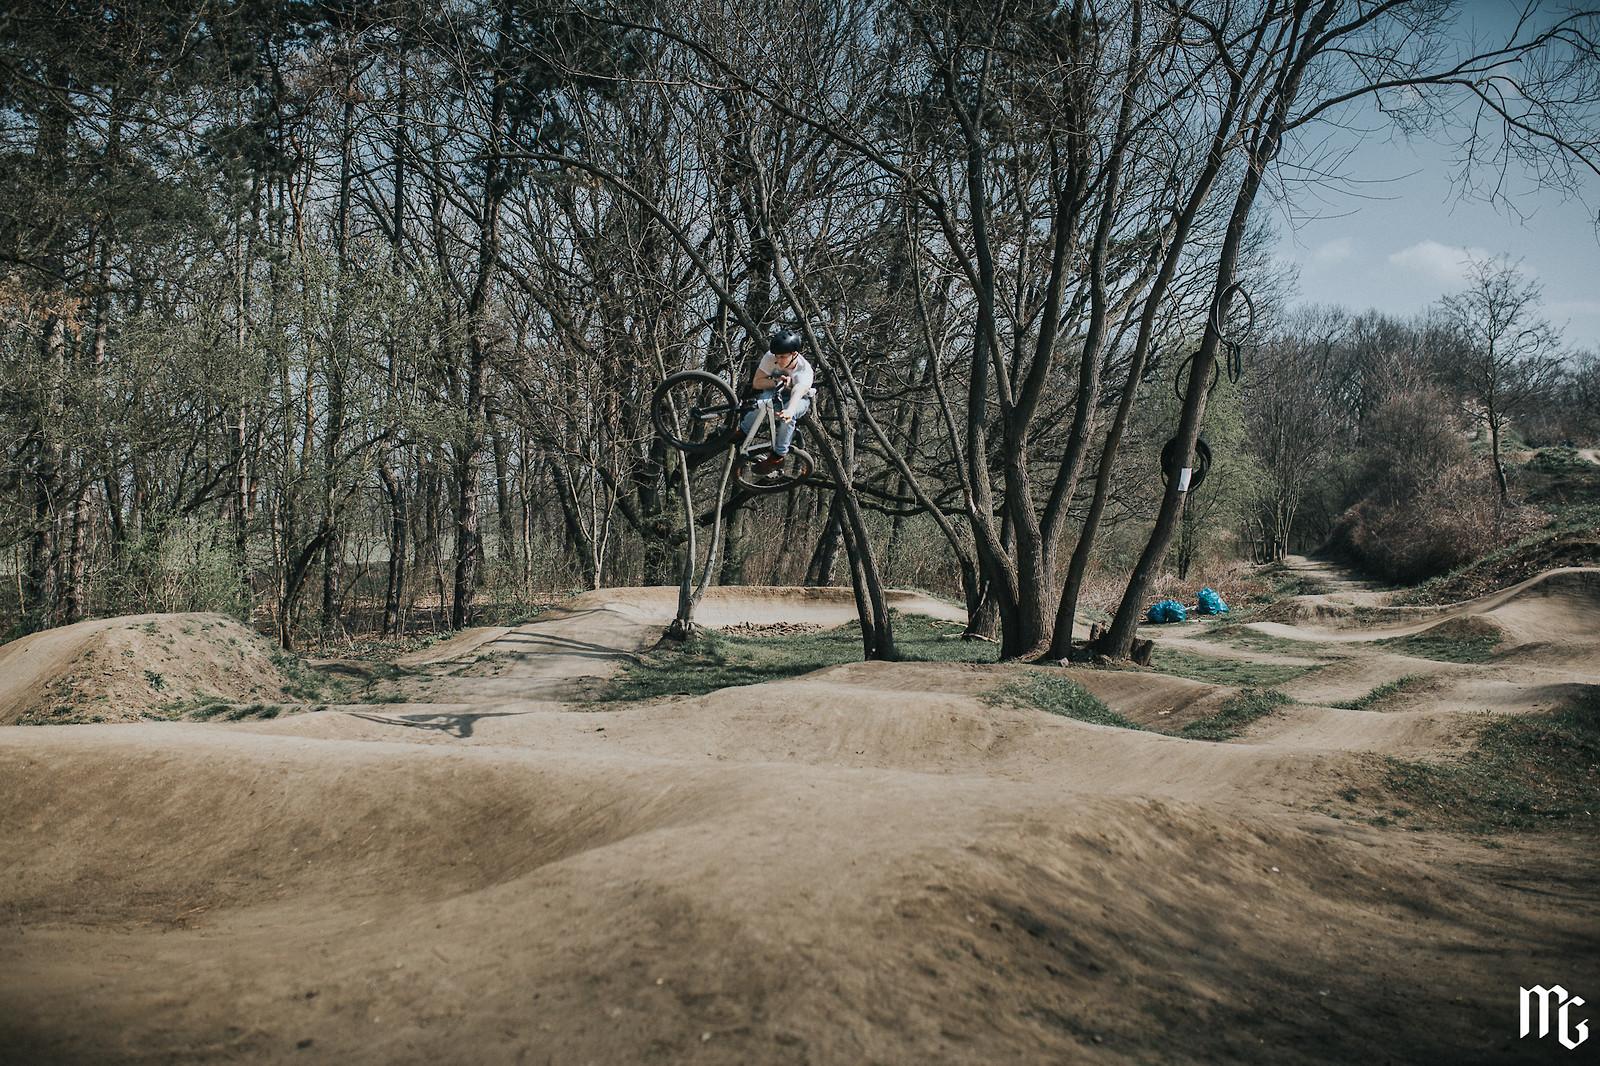 pump jump - Kick!Photo - Mountain Biking Pictures - Vital MTB